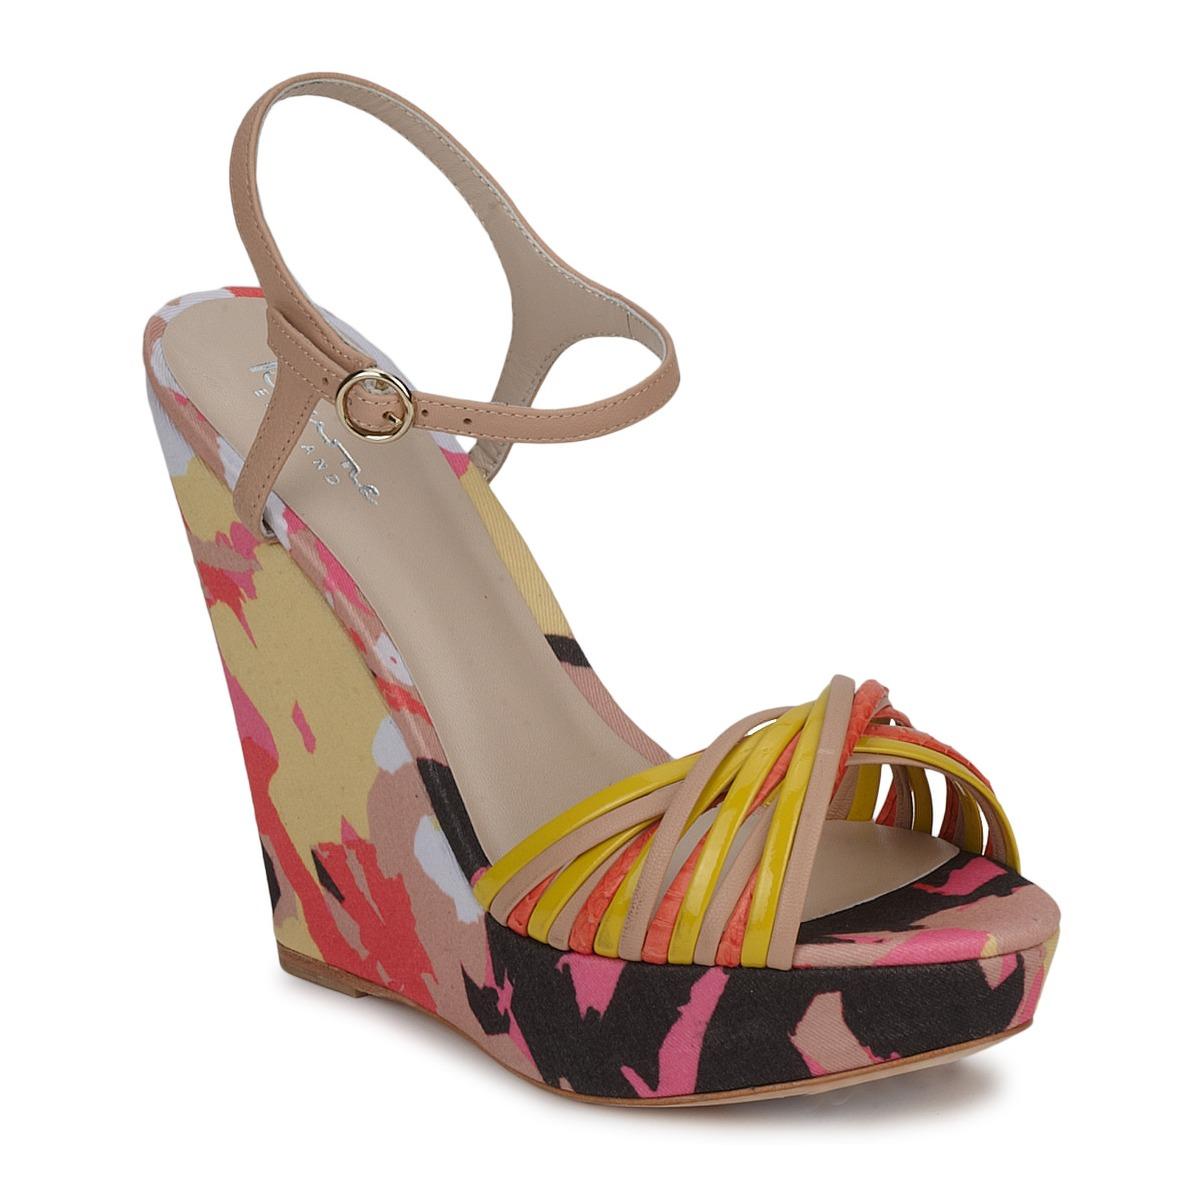 Sandale Bourne KARMEL Beige / Multicolore